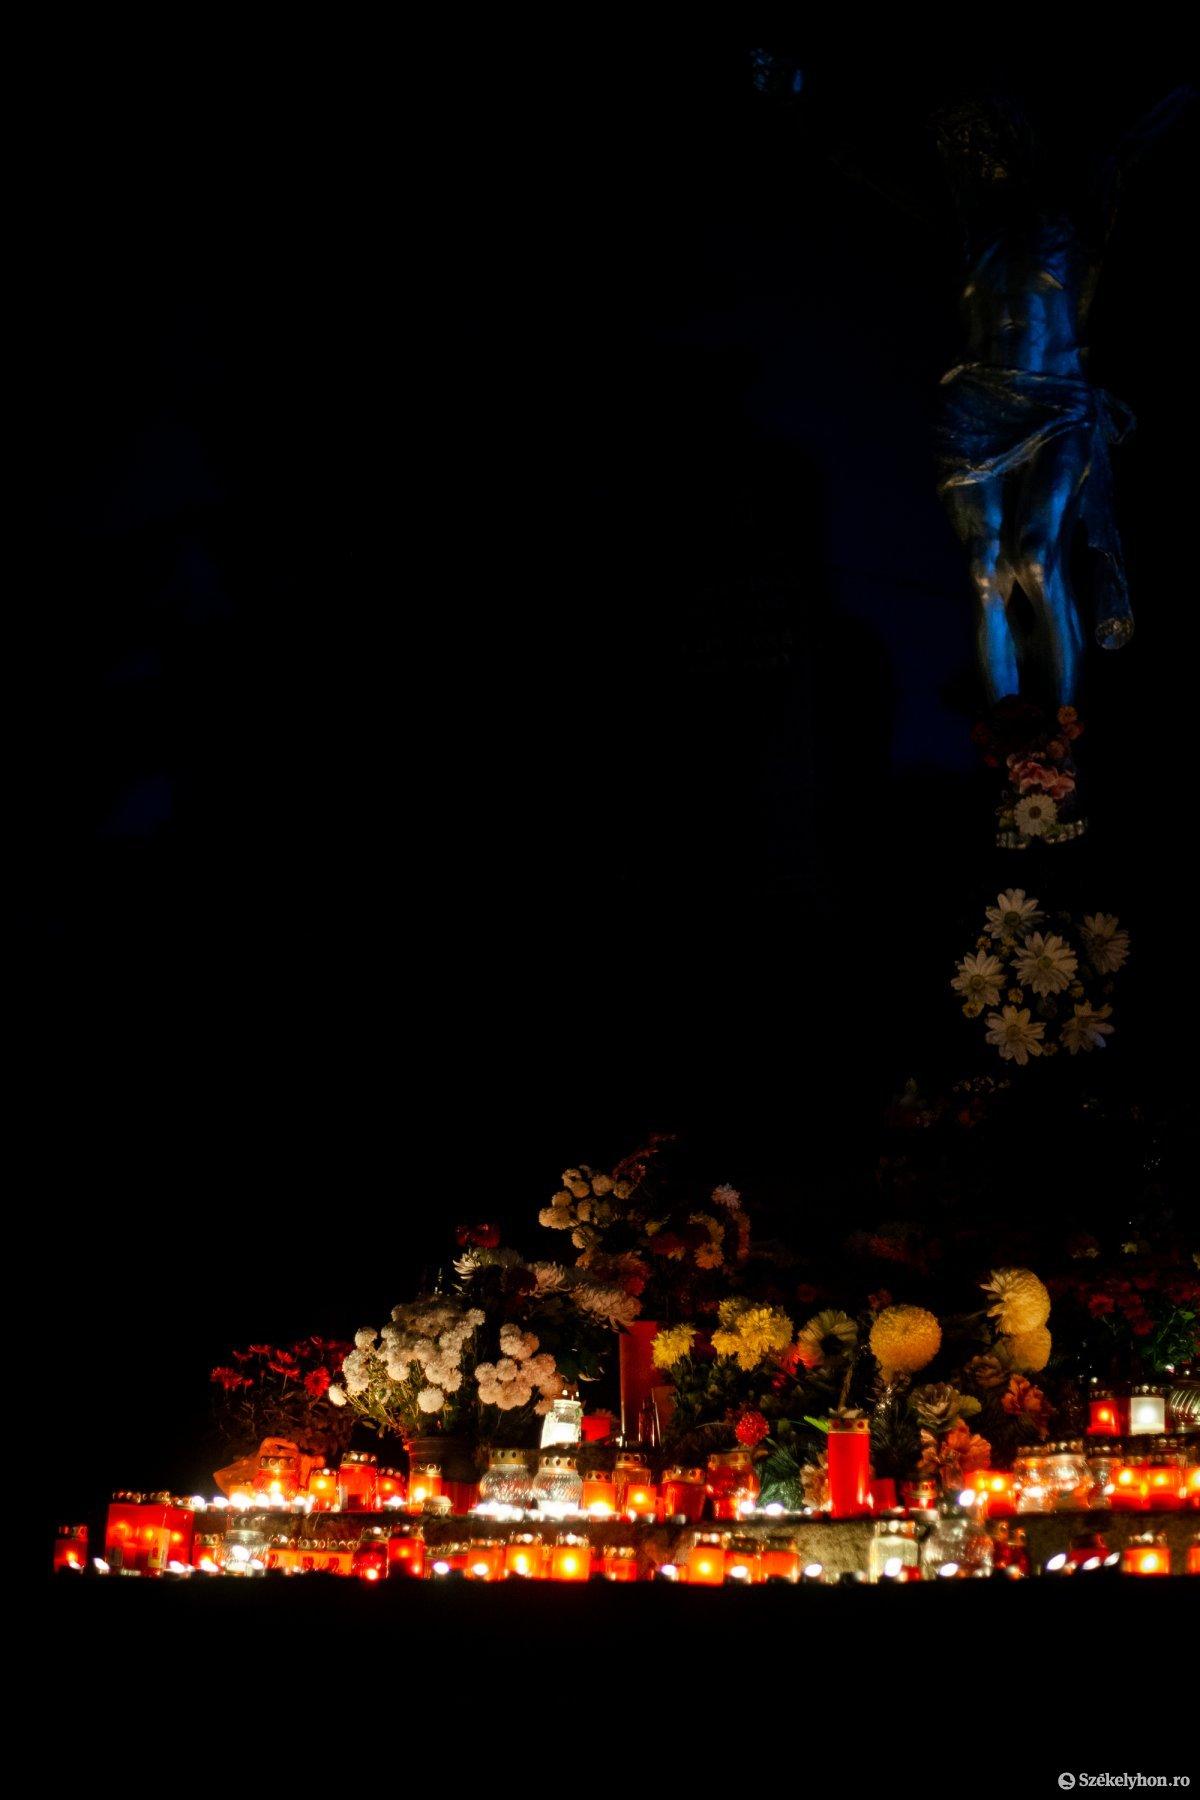 https://media.szekelyhon.ro/pictures/vasarhely/aktualis/2020/02_november/o_halottak-napja-2020-vasarhely_rz-16.jpg